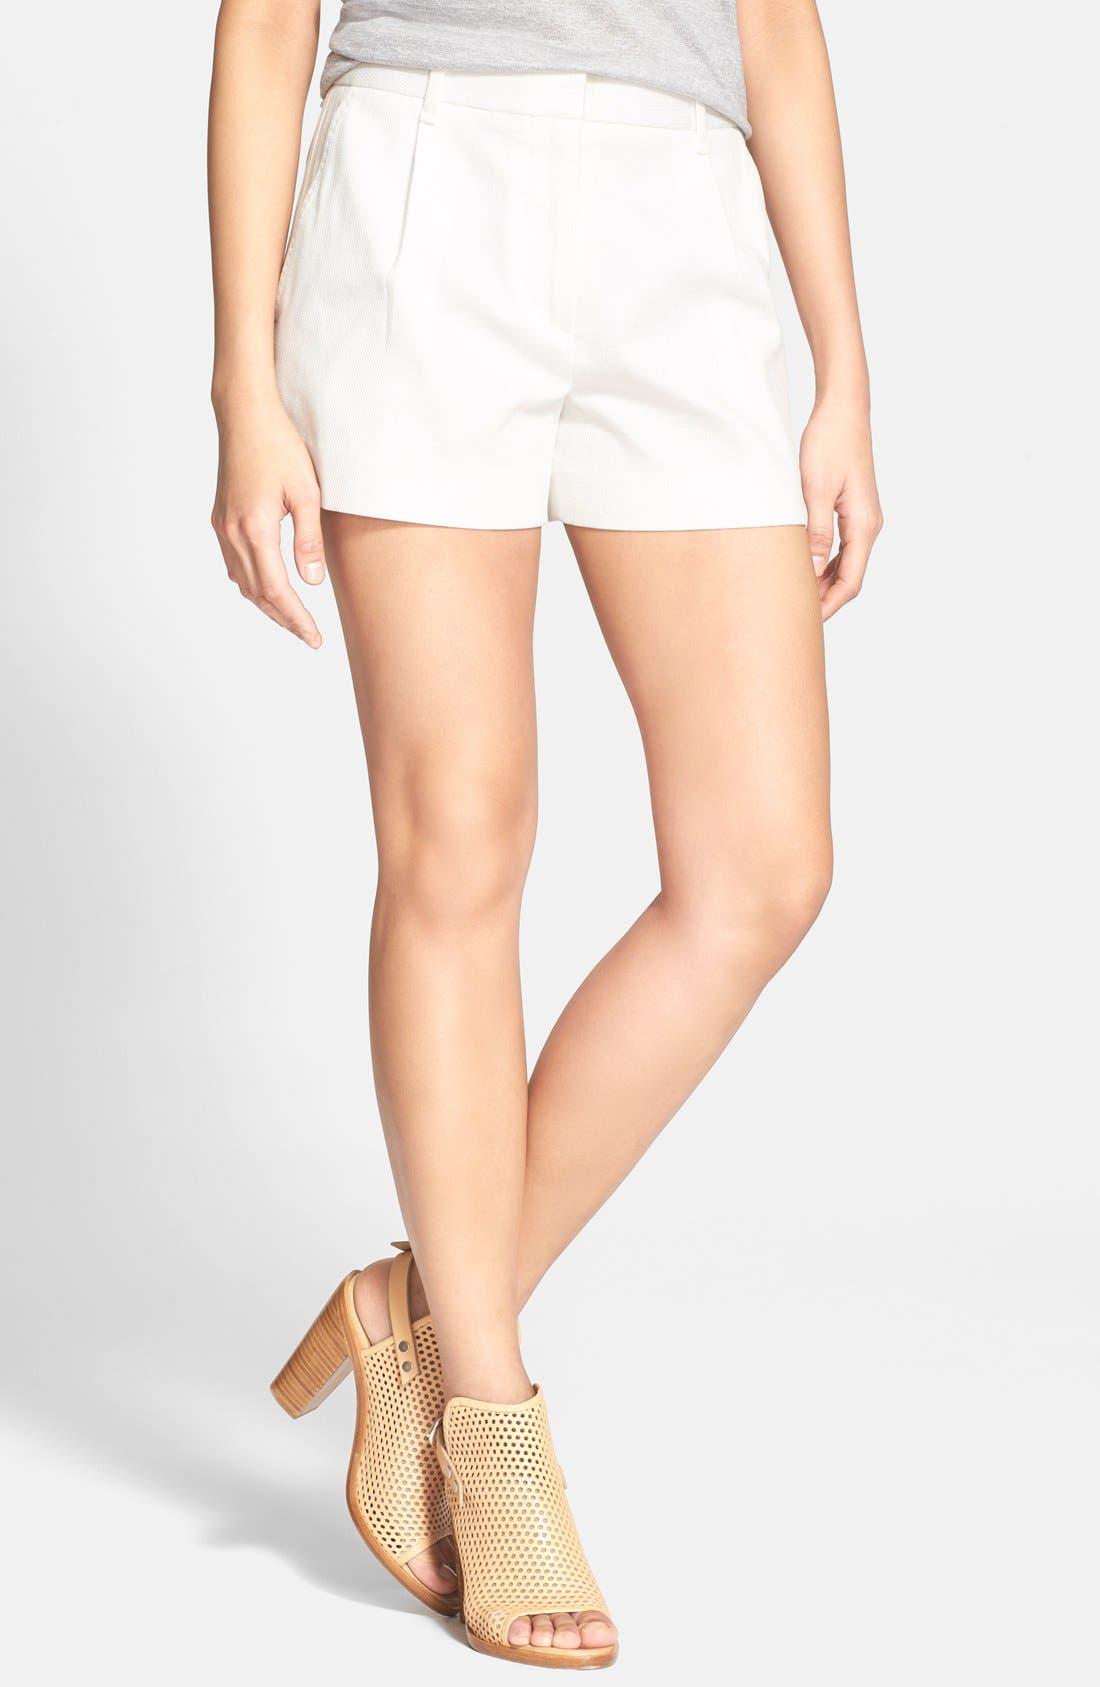 RAG & BONE 'Montgomery' Stretch Cotton Shorts, Main, color, 105